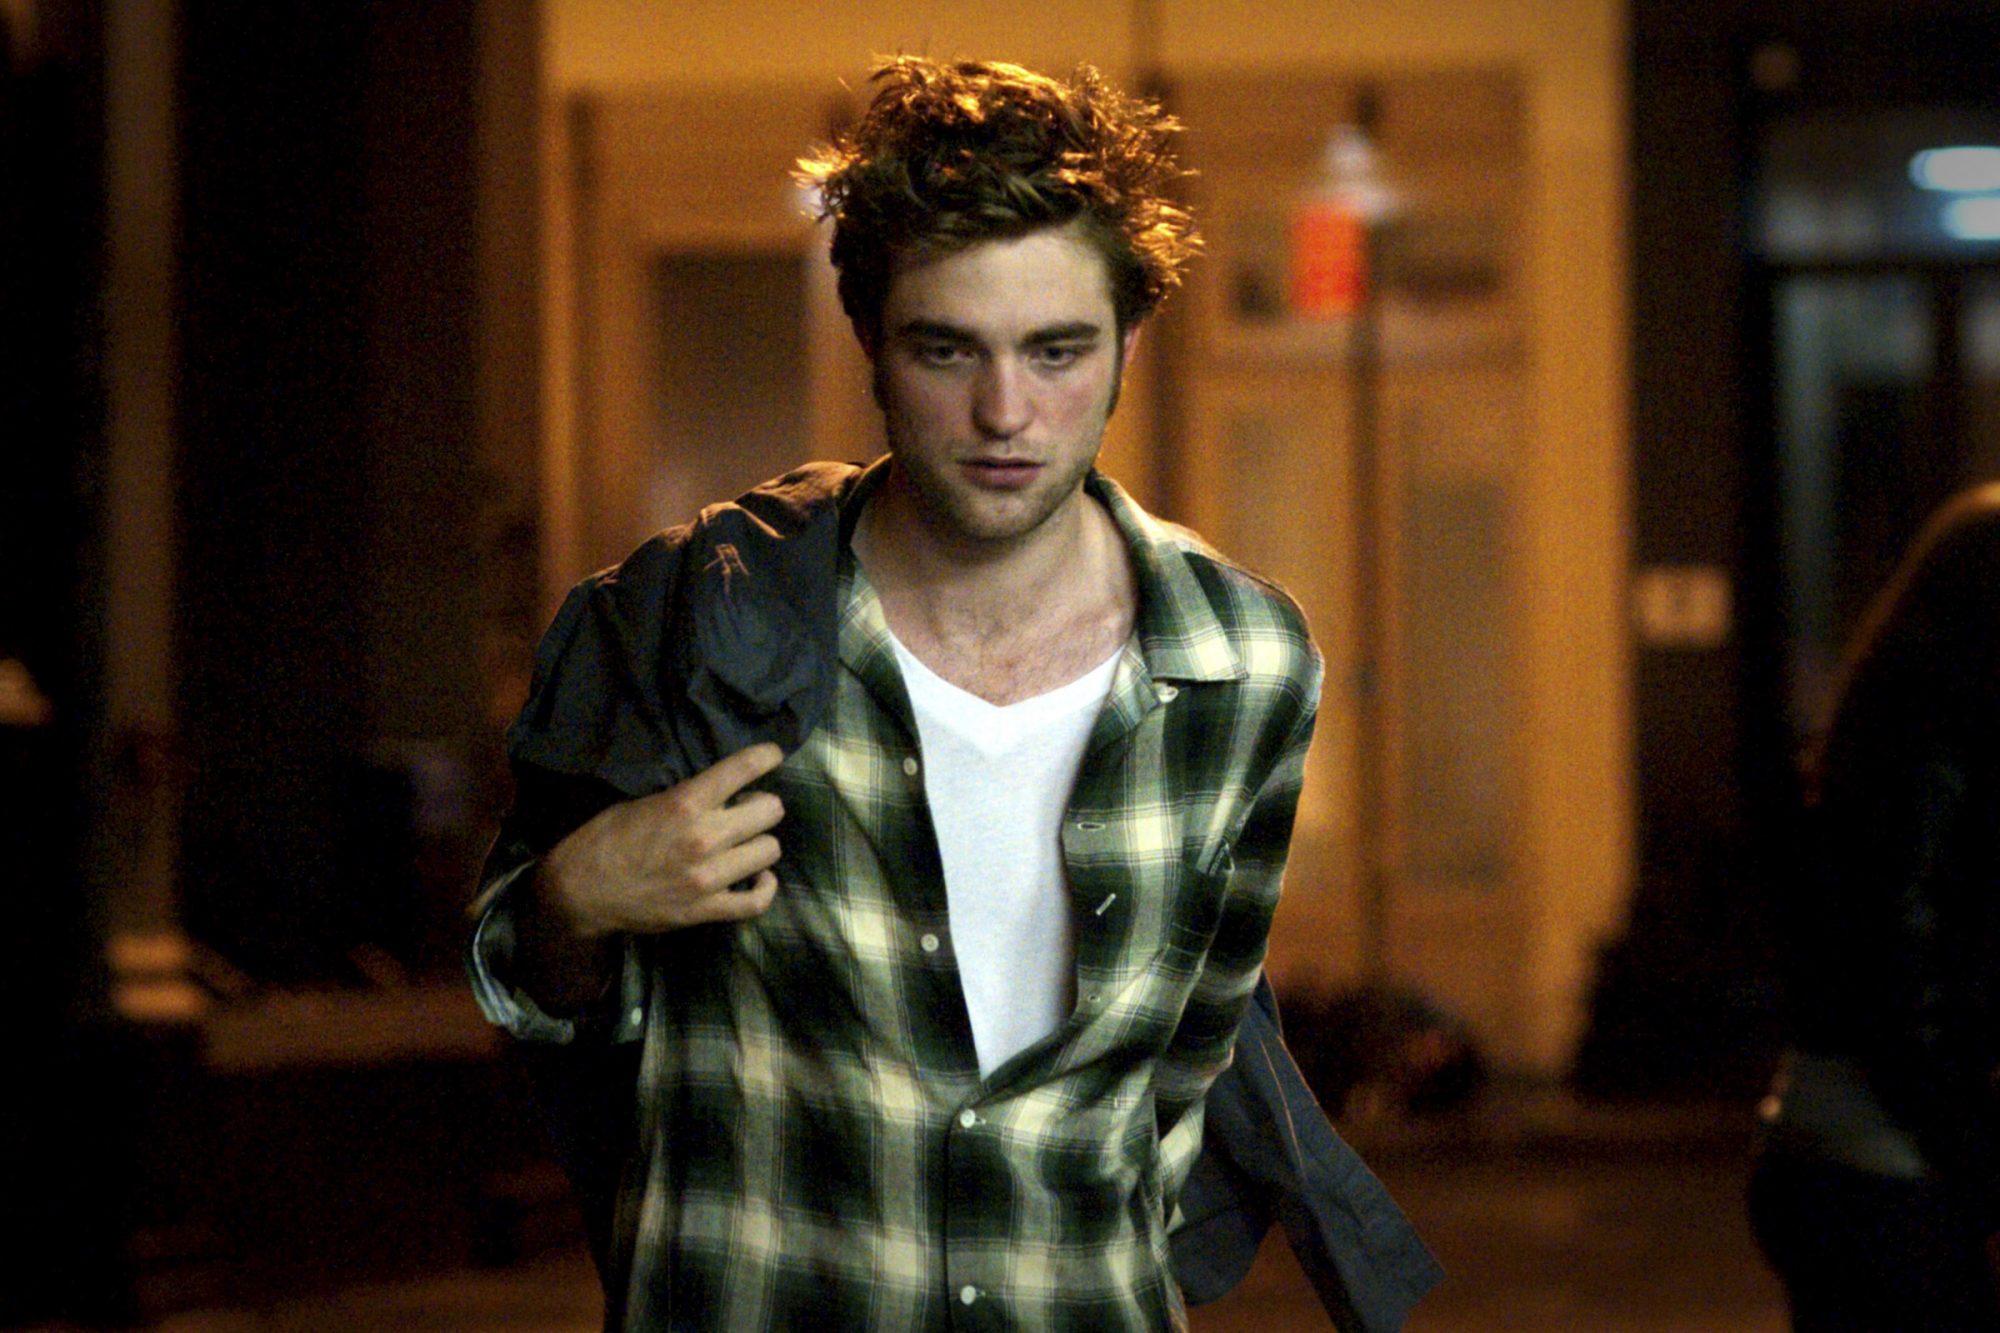 REMEMBER ME, Robert Pattinson, 2010. ph: Nicole Rivelli/©Summit Entertainment/courtesy Everett Colle